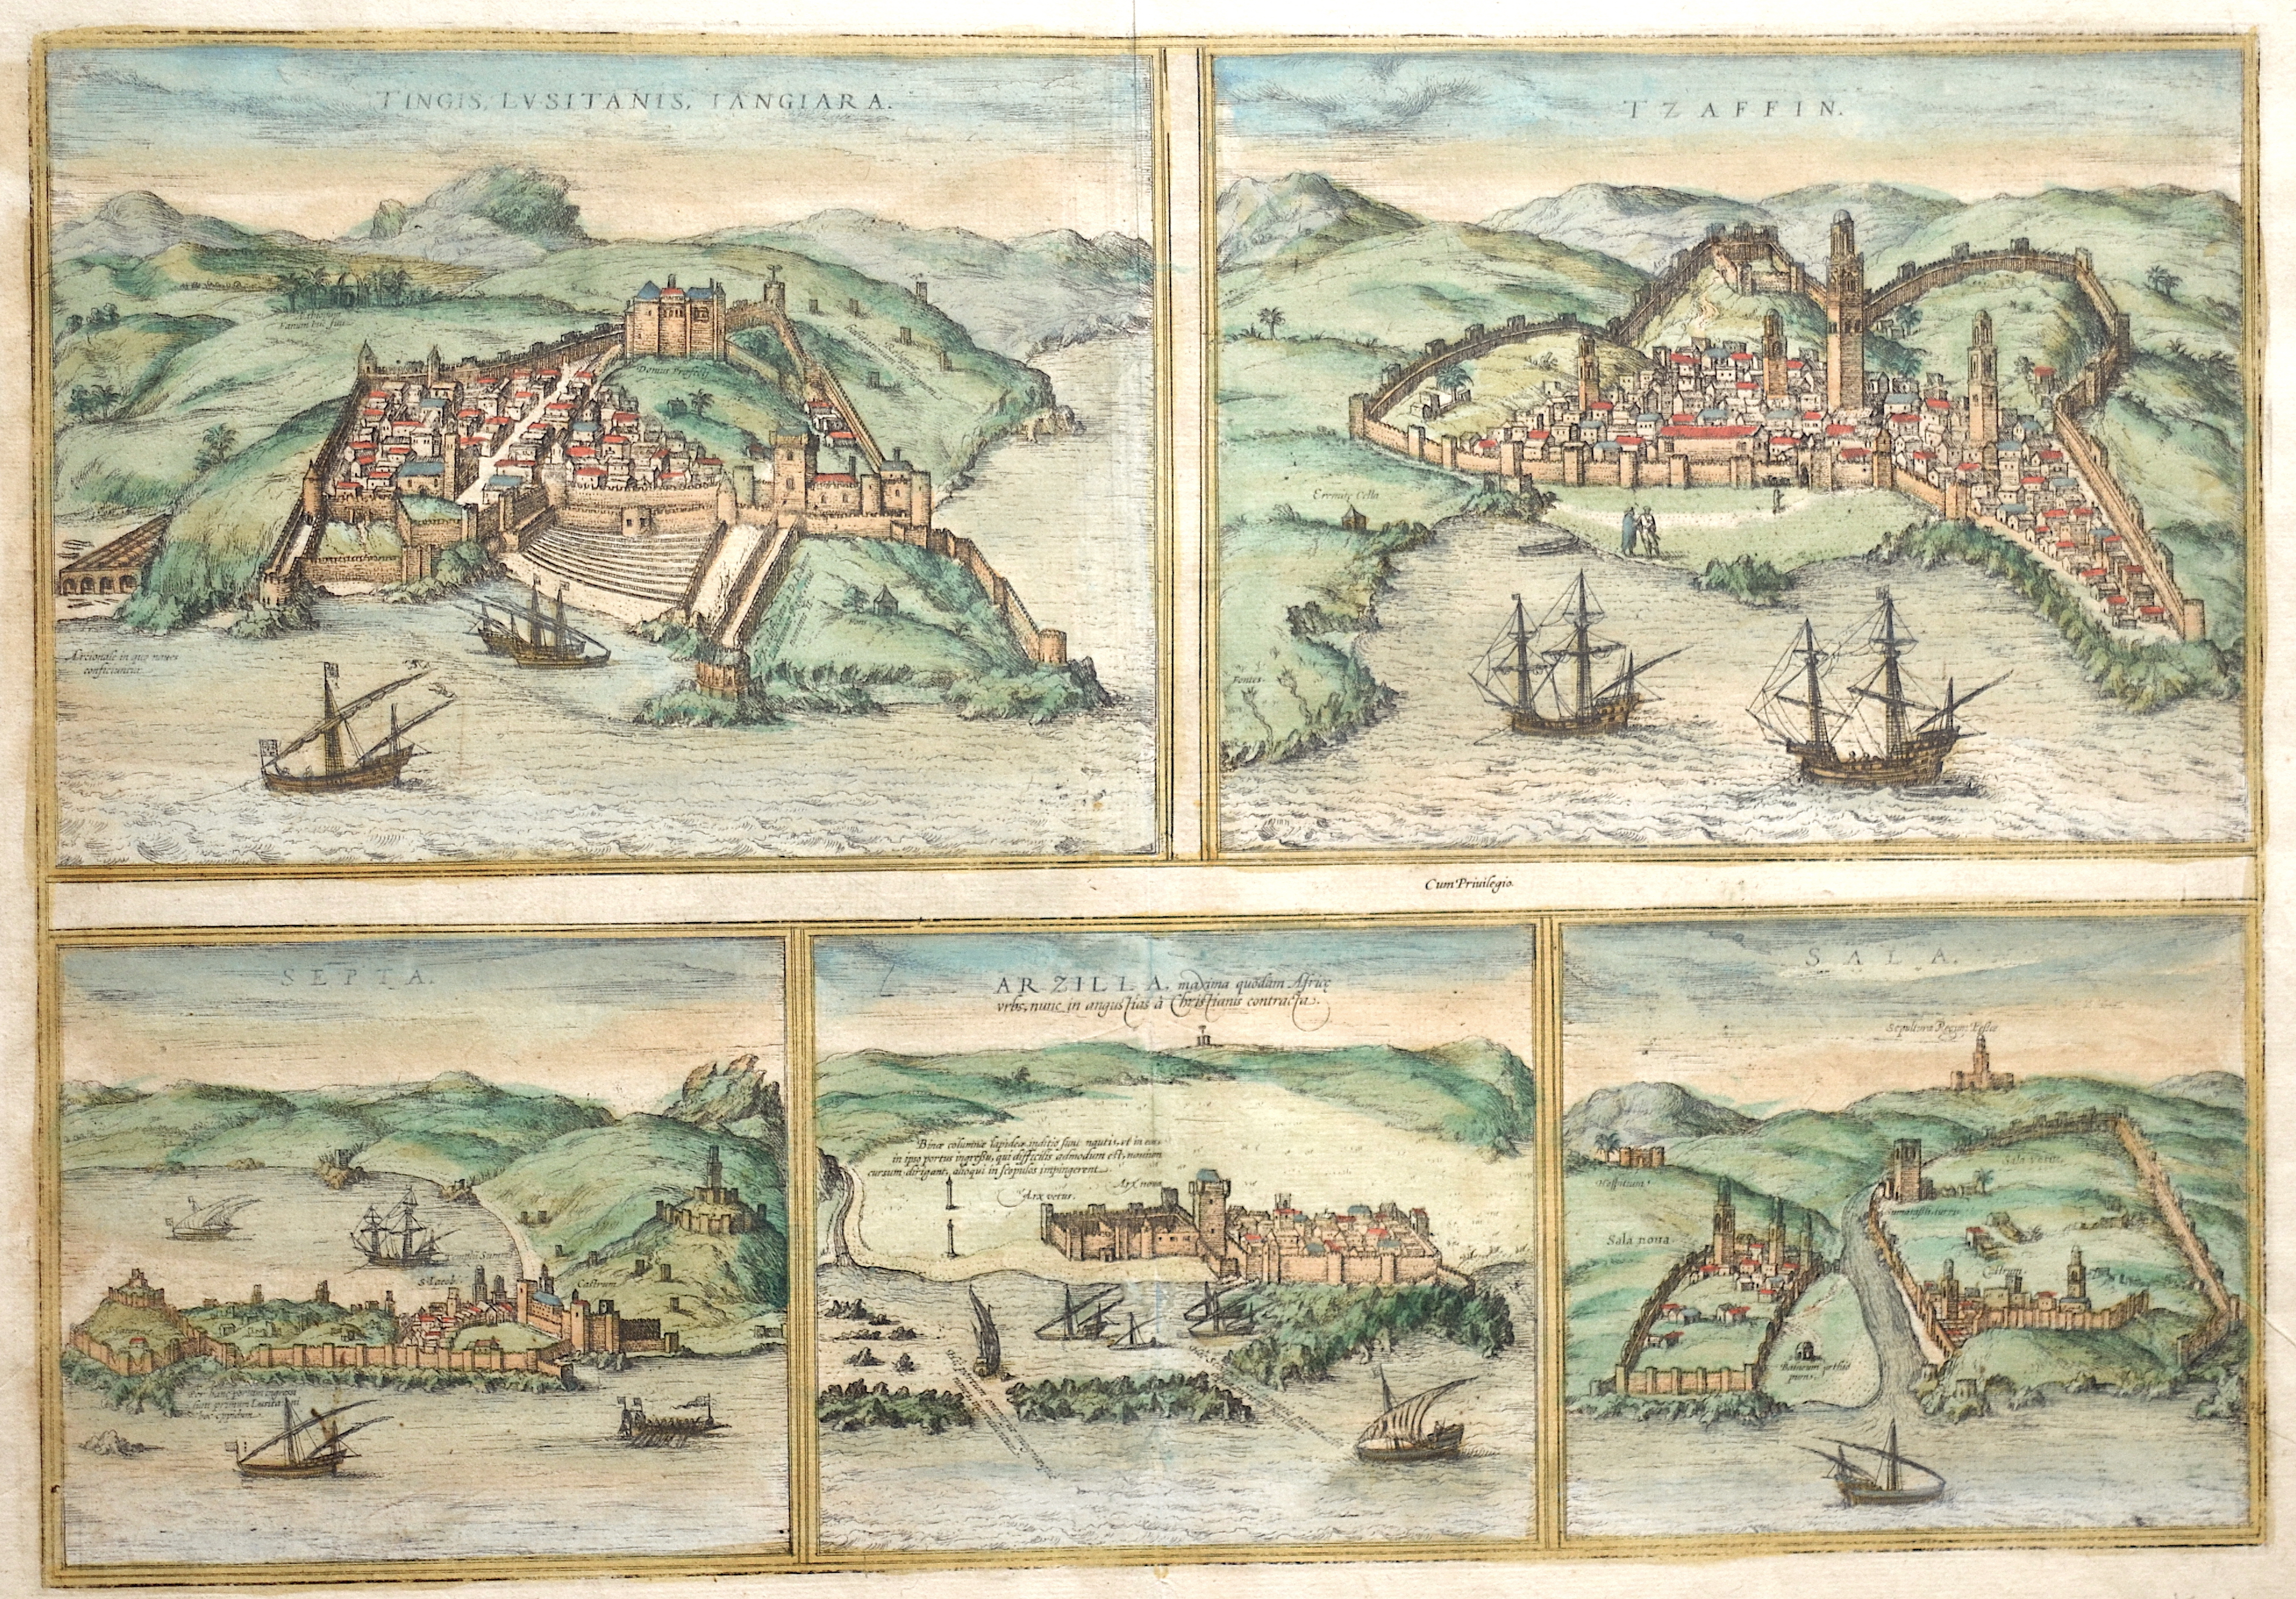 Braun/Hogenberg Franz/ Georg Tingis, Lusitanis, Iangiara. / Tzaffin. / Septa. / Arzilla / Sala.